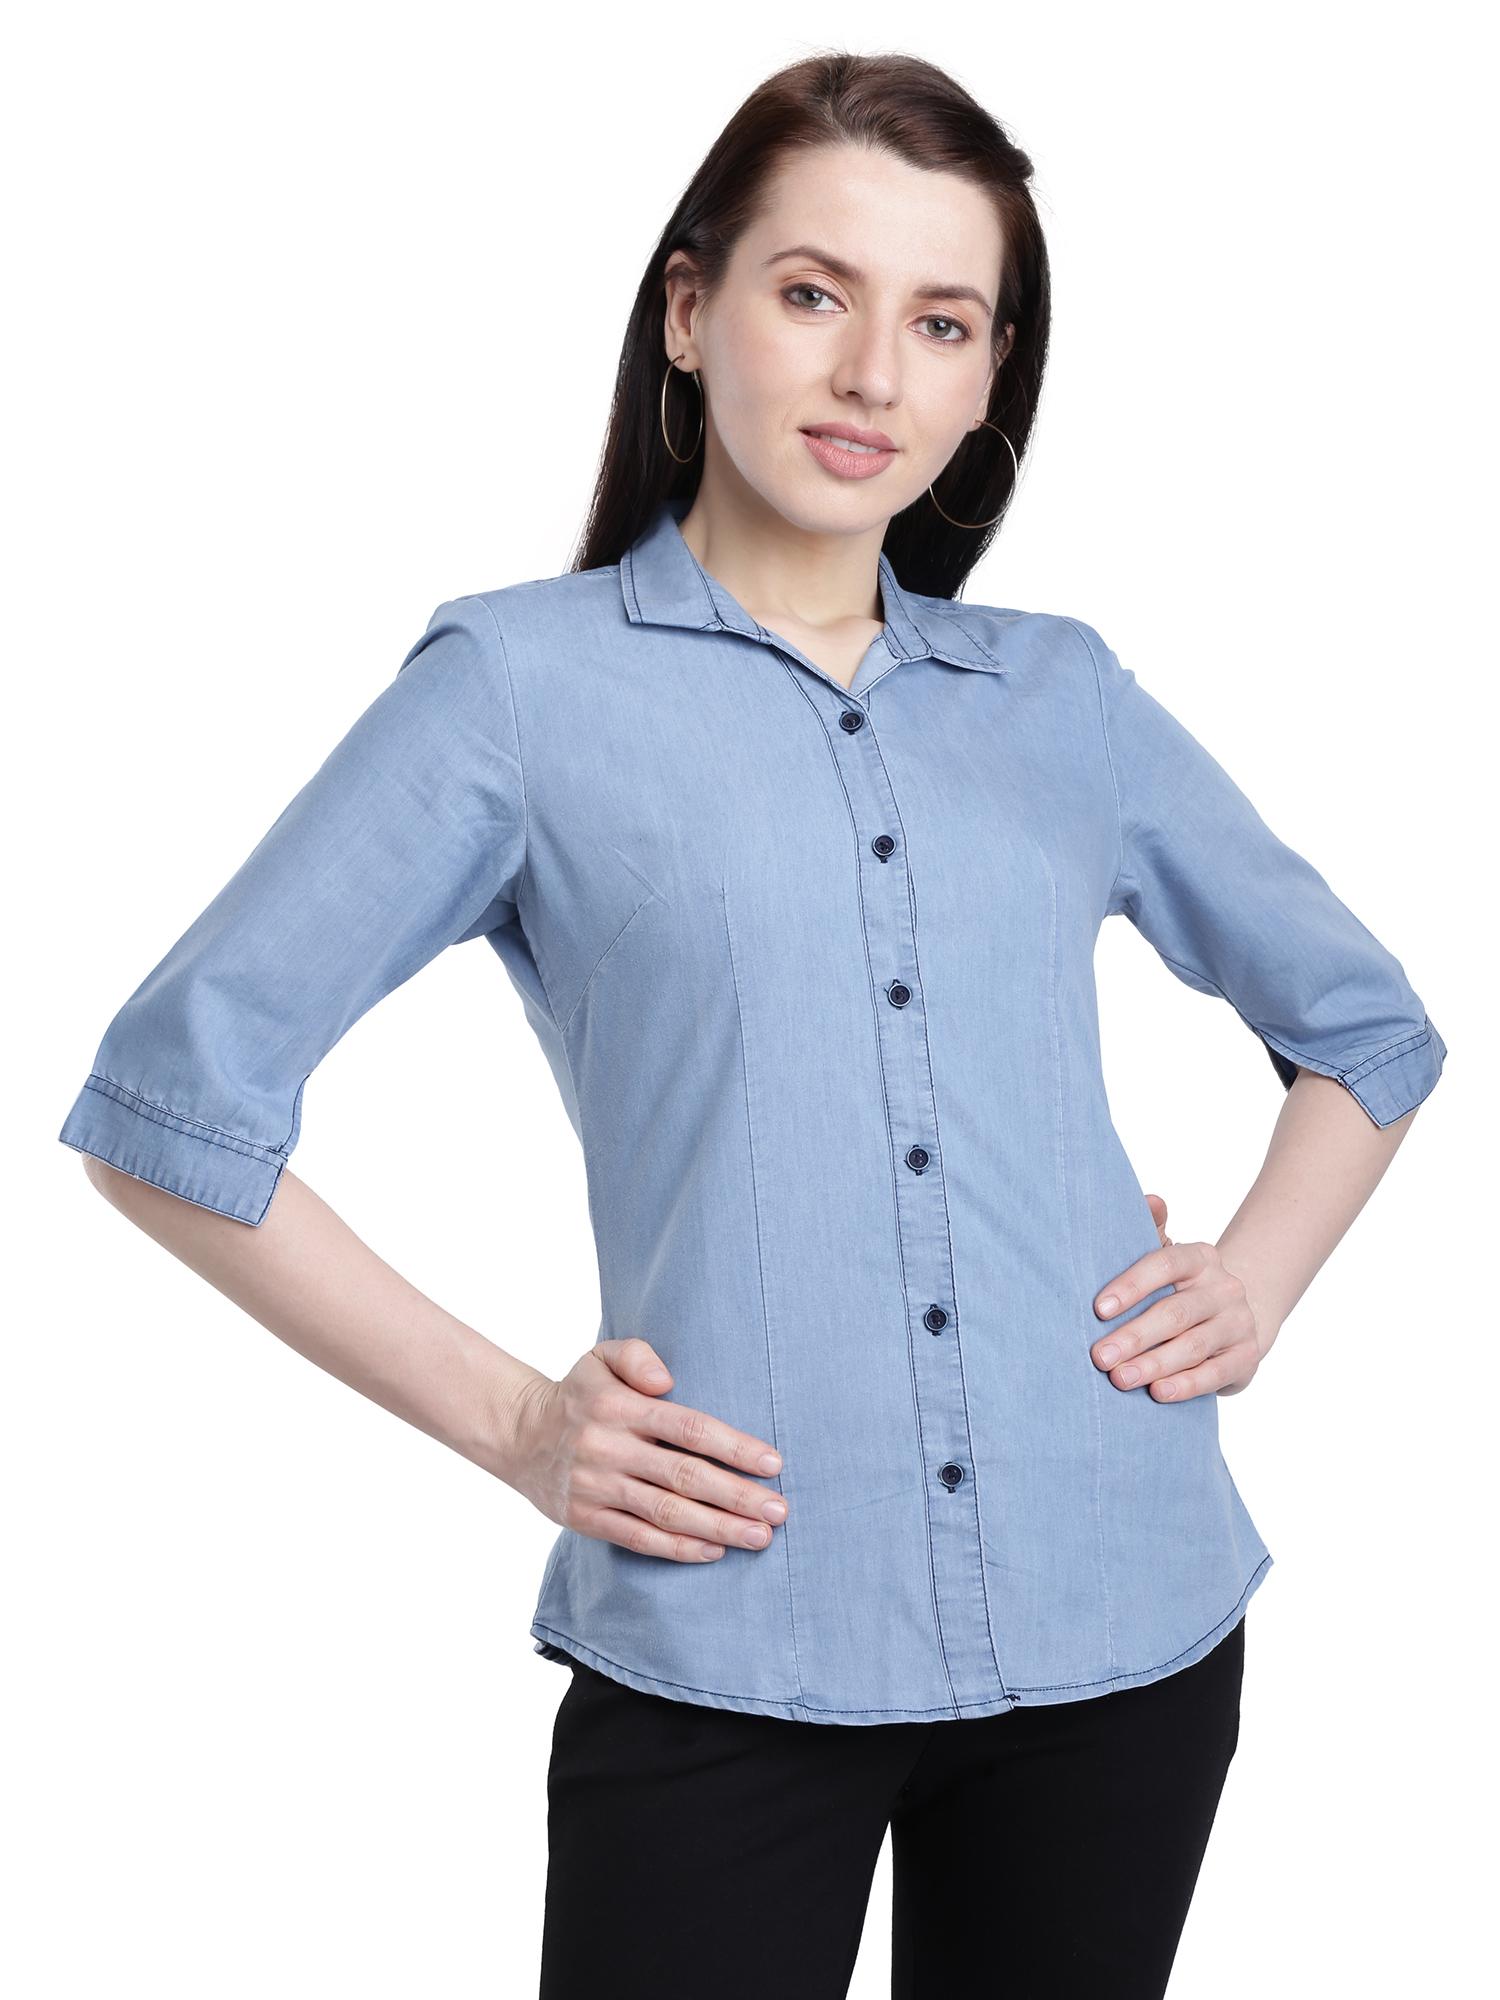 Kandy Women's Plain 3/4 Sleeves Casual LightBlue Denim Shirt